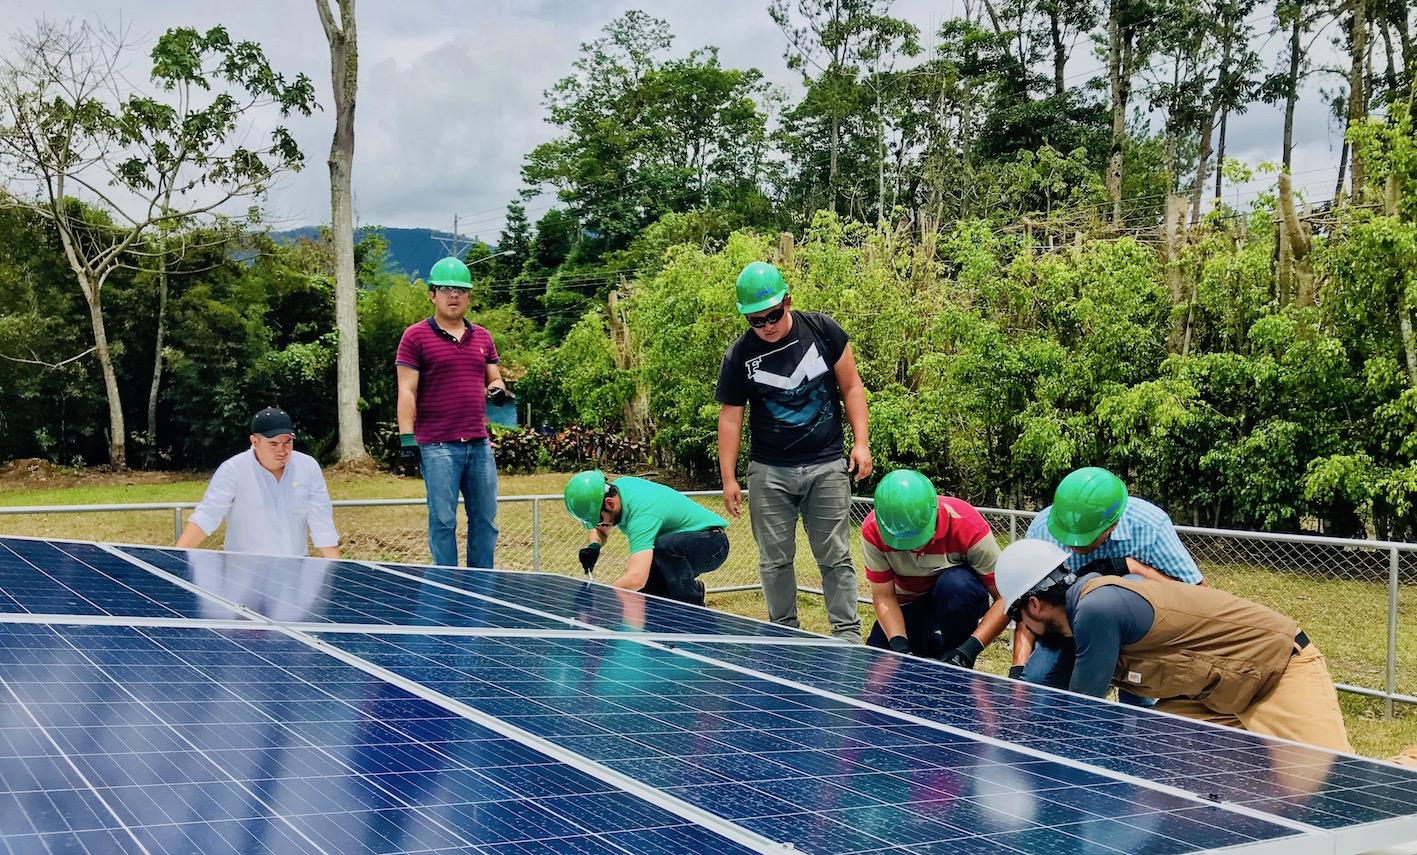 Solar Energy International (SEI) opens its first International Solar